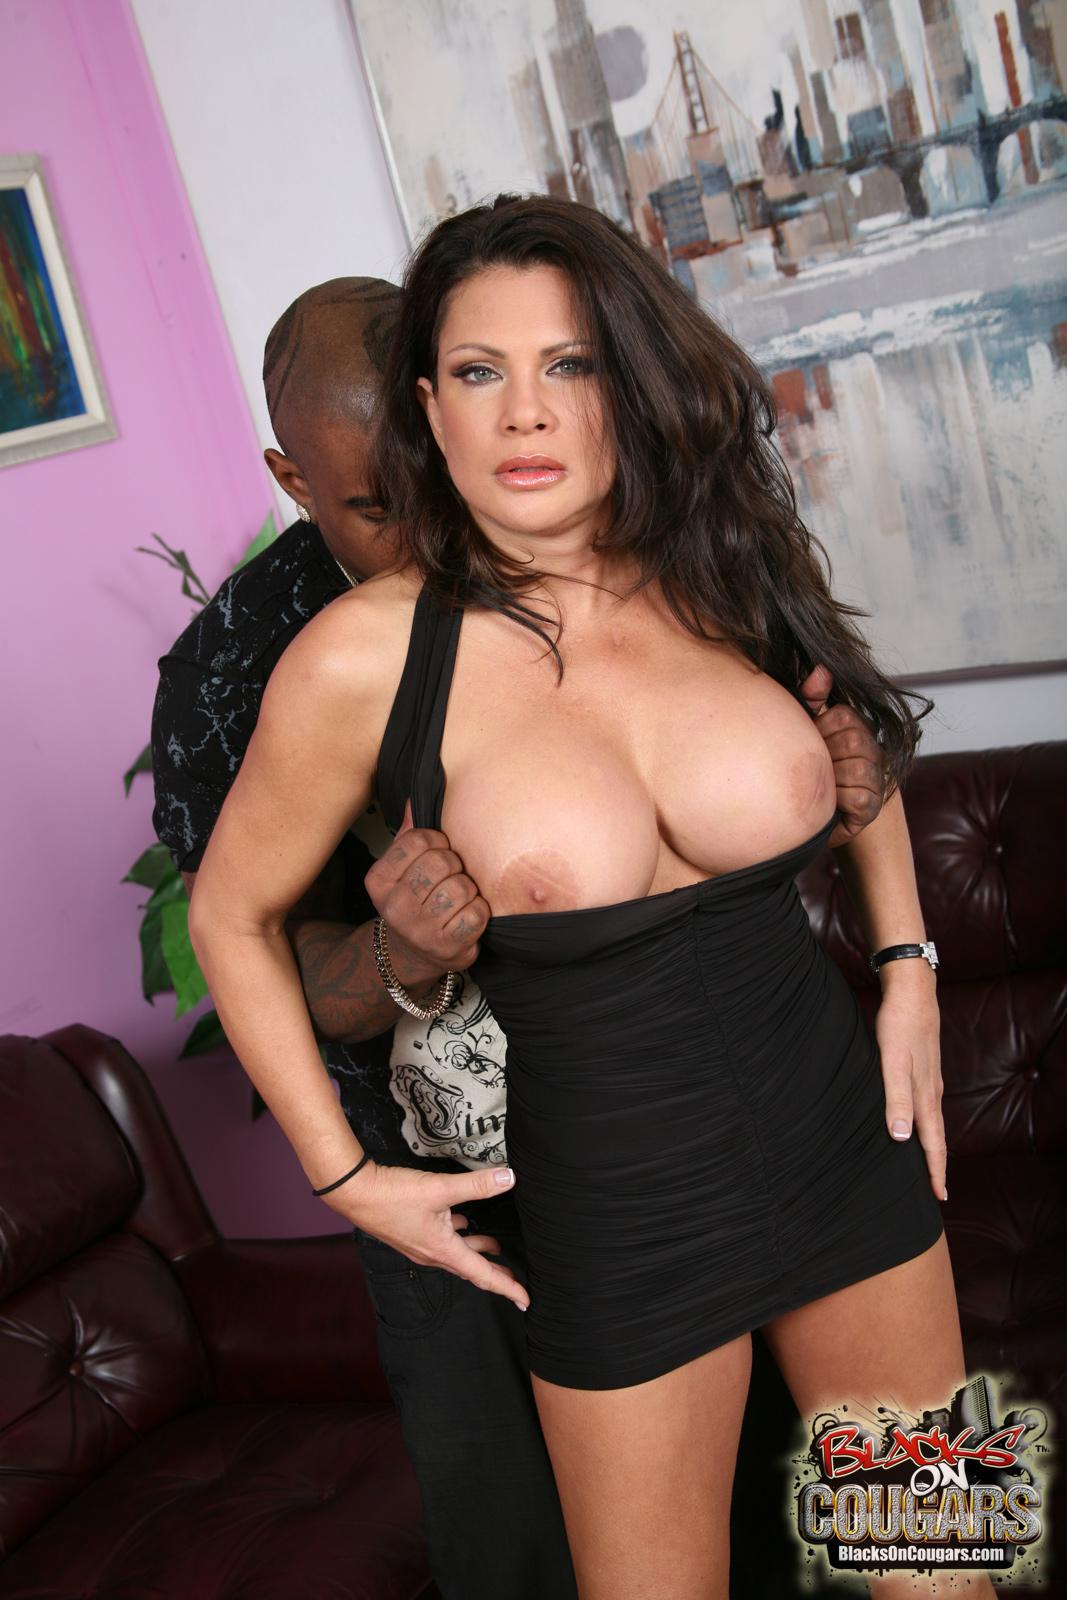 brunette milf interracial - Slutty brunette milf in black dress has interracial sex with big cocked  chocolate guy